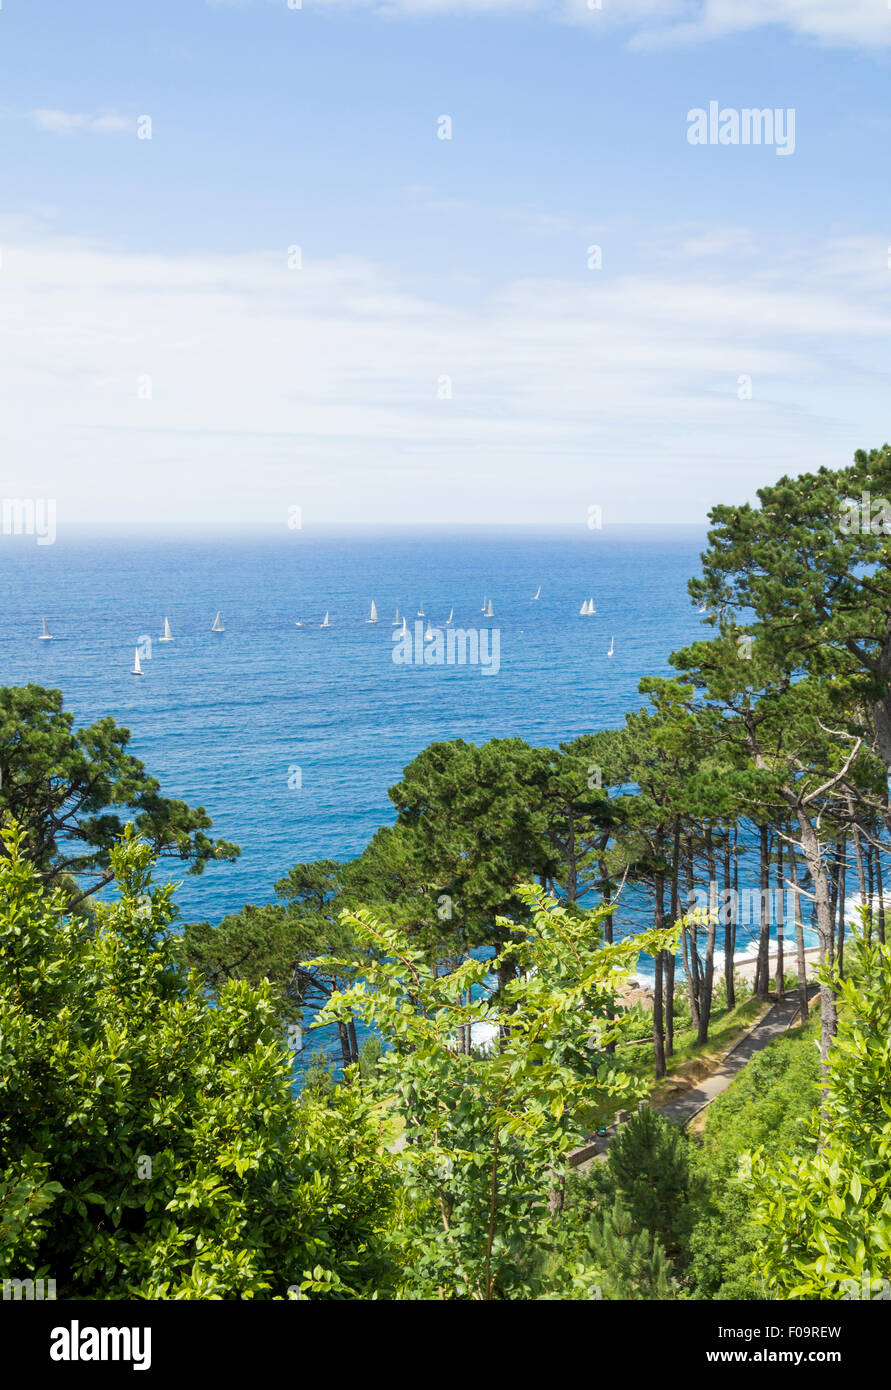 Yachts sailing off the coast of San Sebastian (Donostia), Basque Country, northern Spain - Stock Image